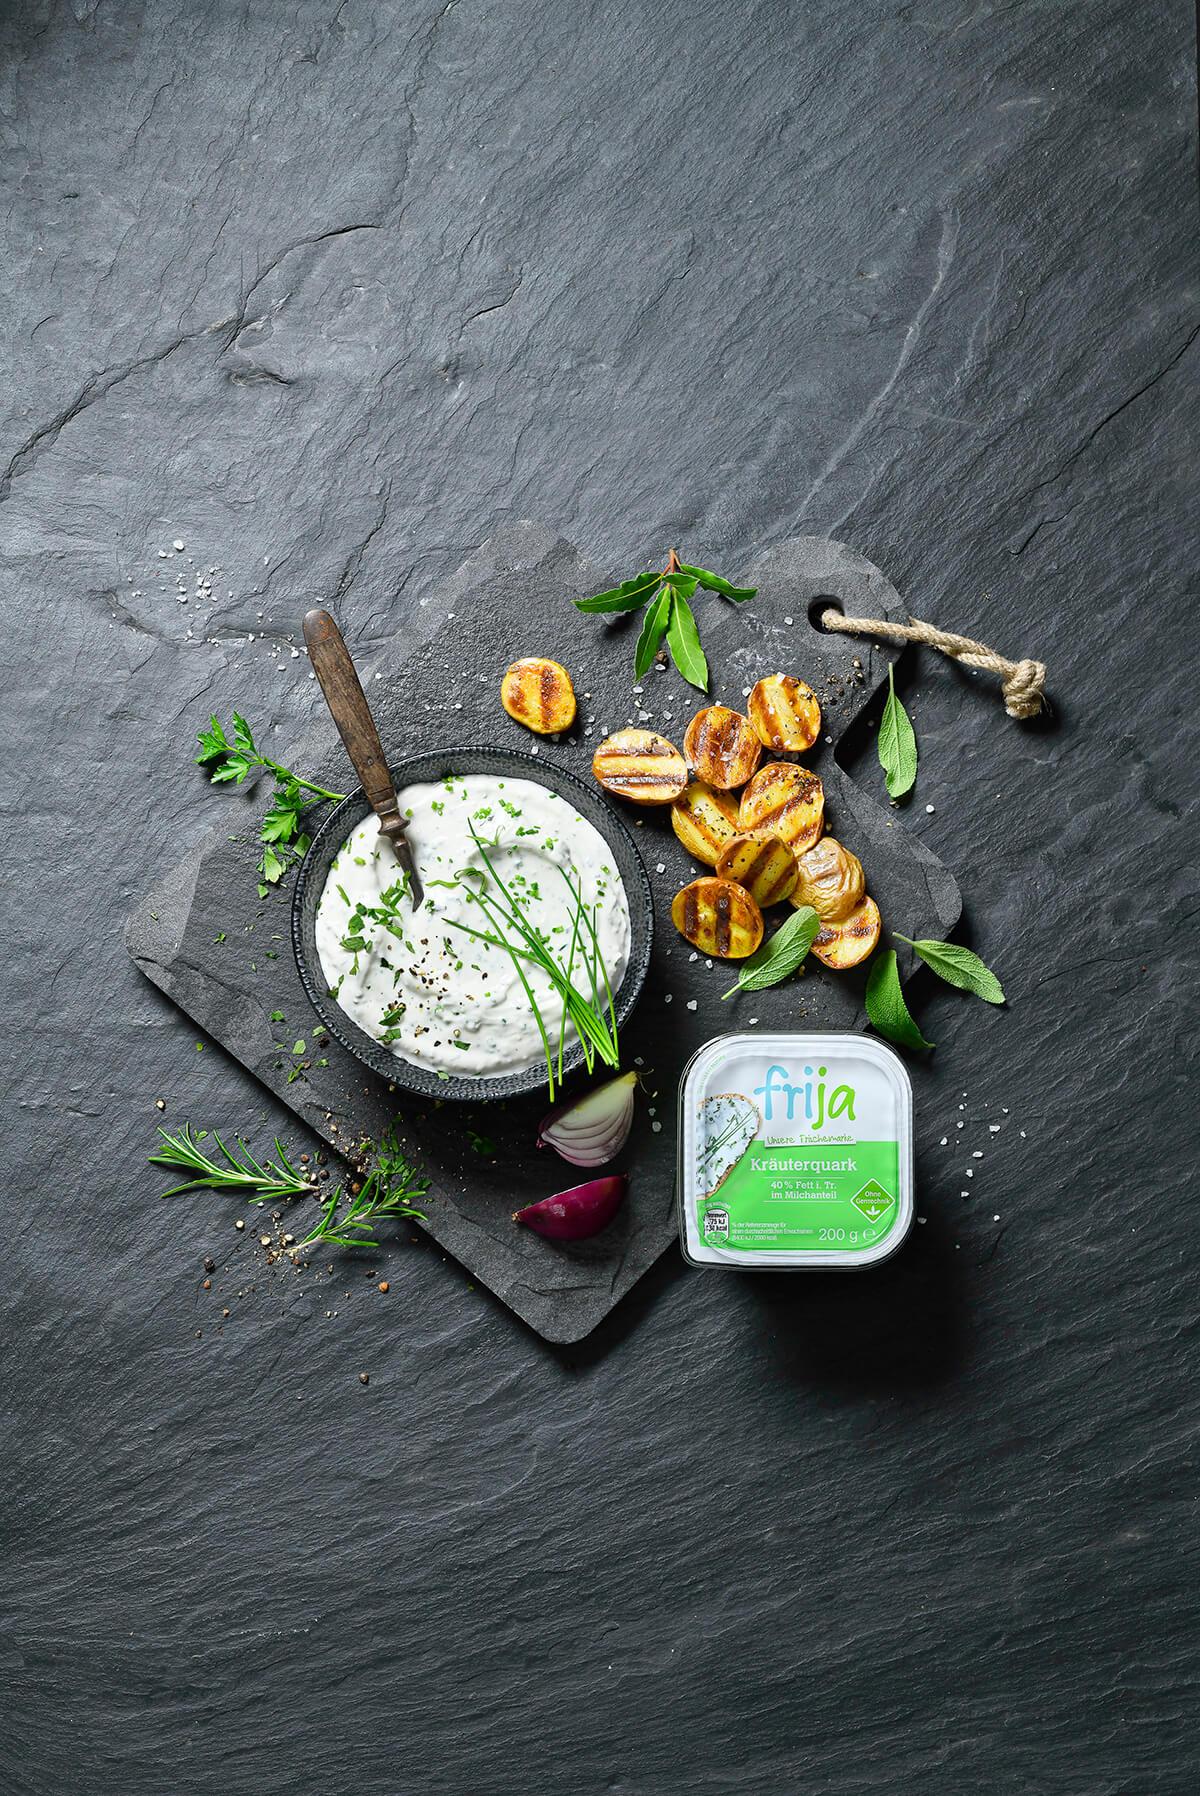 Kräuterquark von Antje Plewinski Foodfotografie